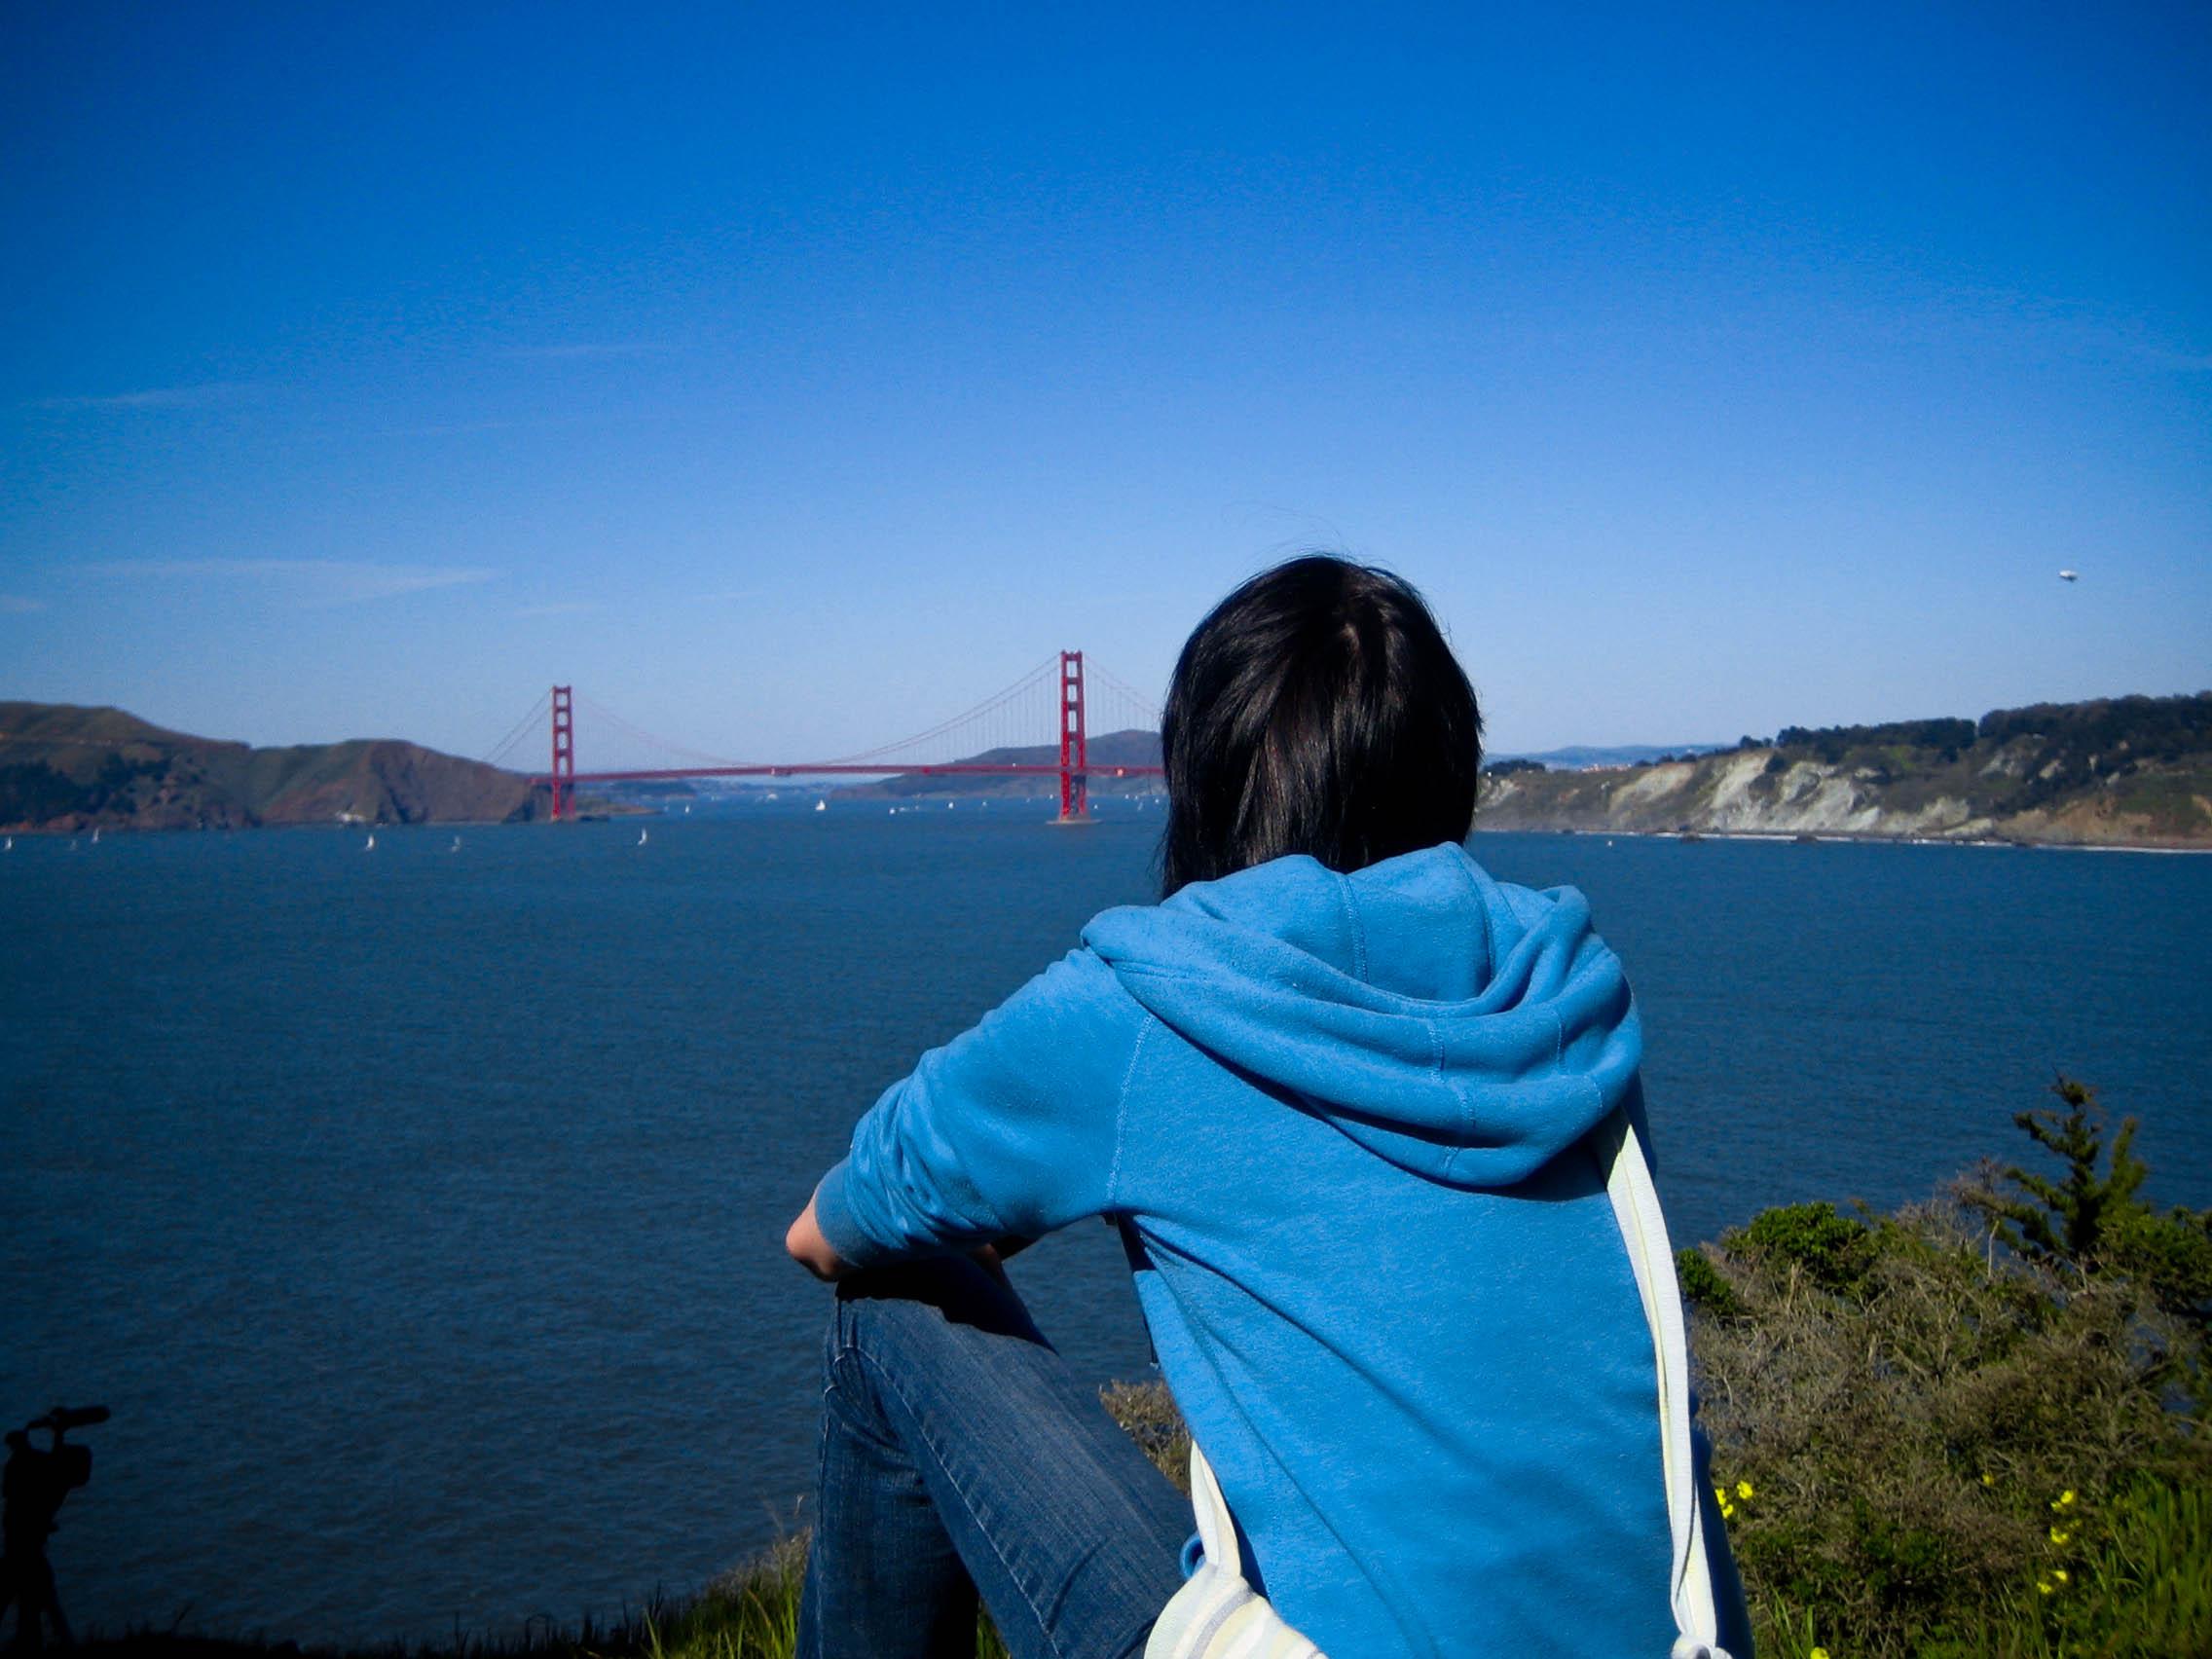 San Francisco, USA (April, 2009)